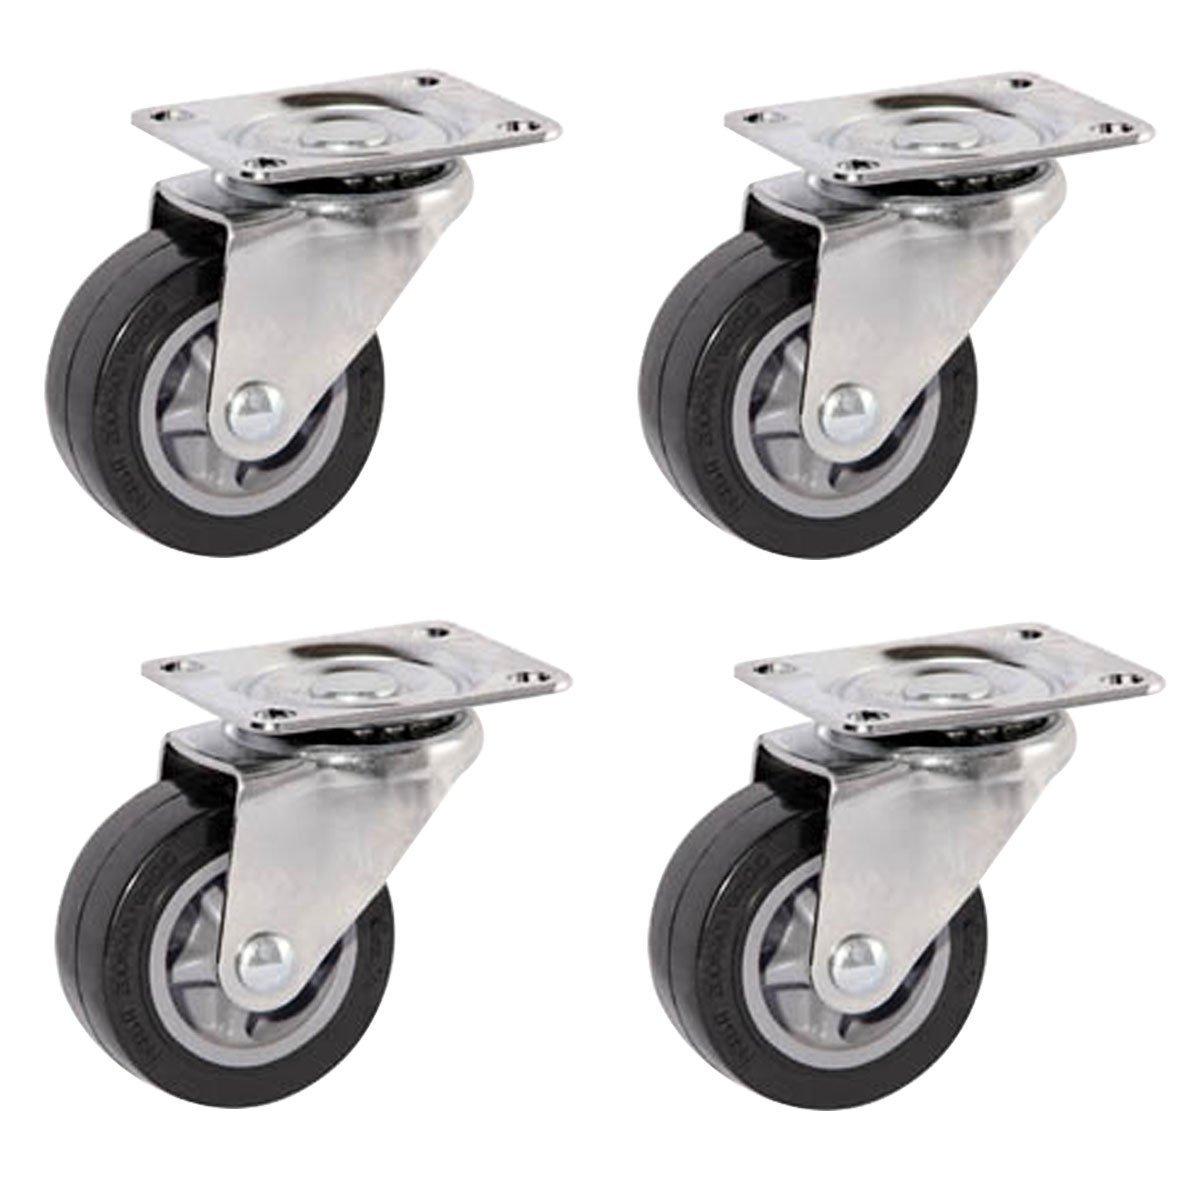 "FactorDuty 4 Pack Caster Wheels Swivel Plate On Black Polyurethane Wheels (2.5"" Wheels no brake)"